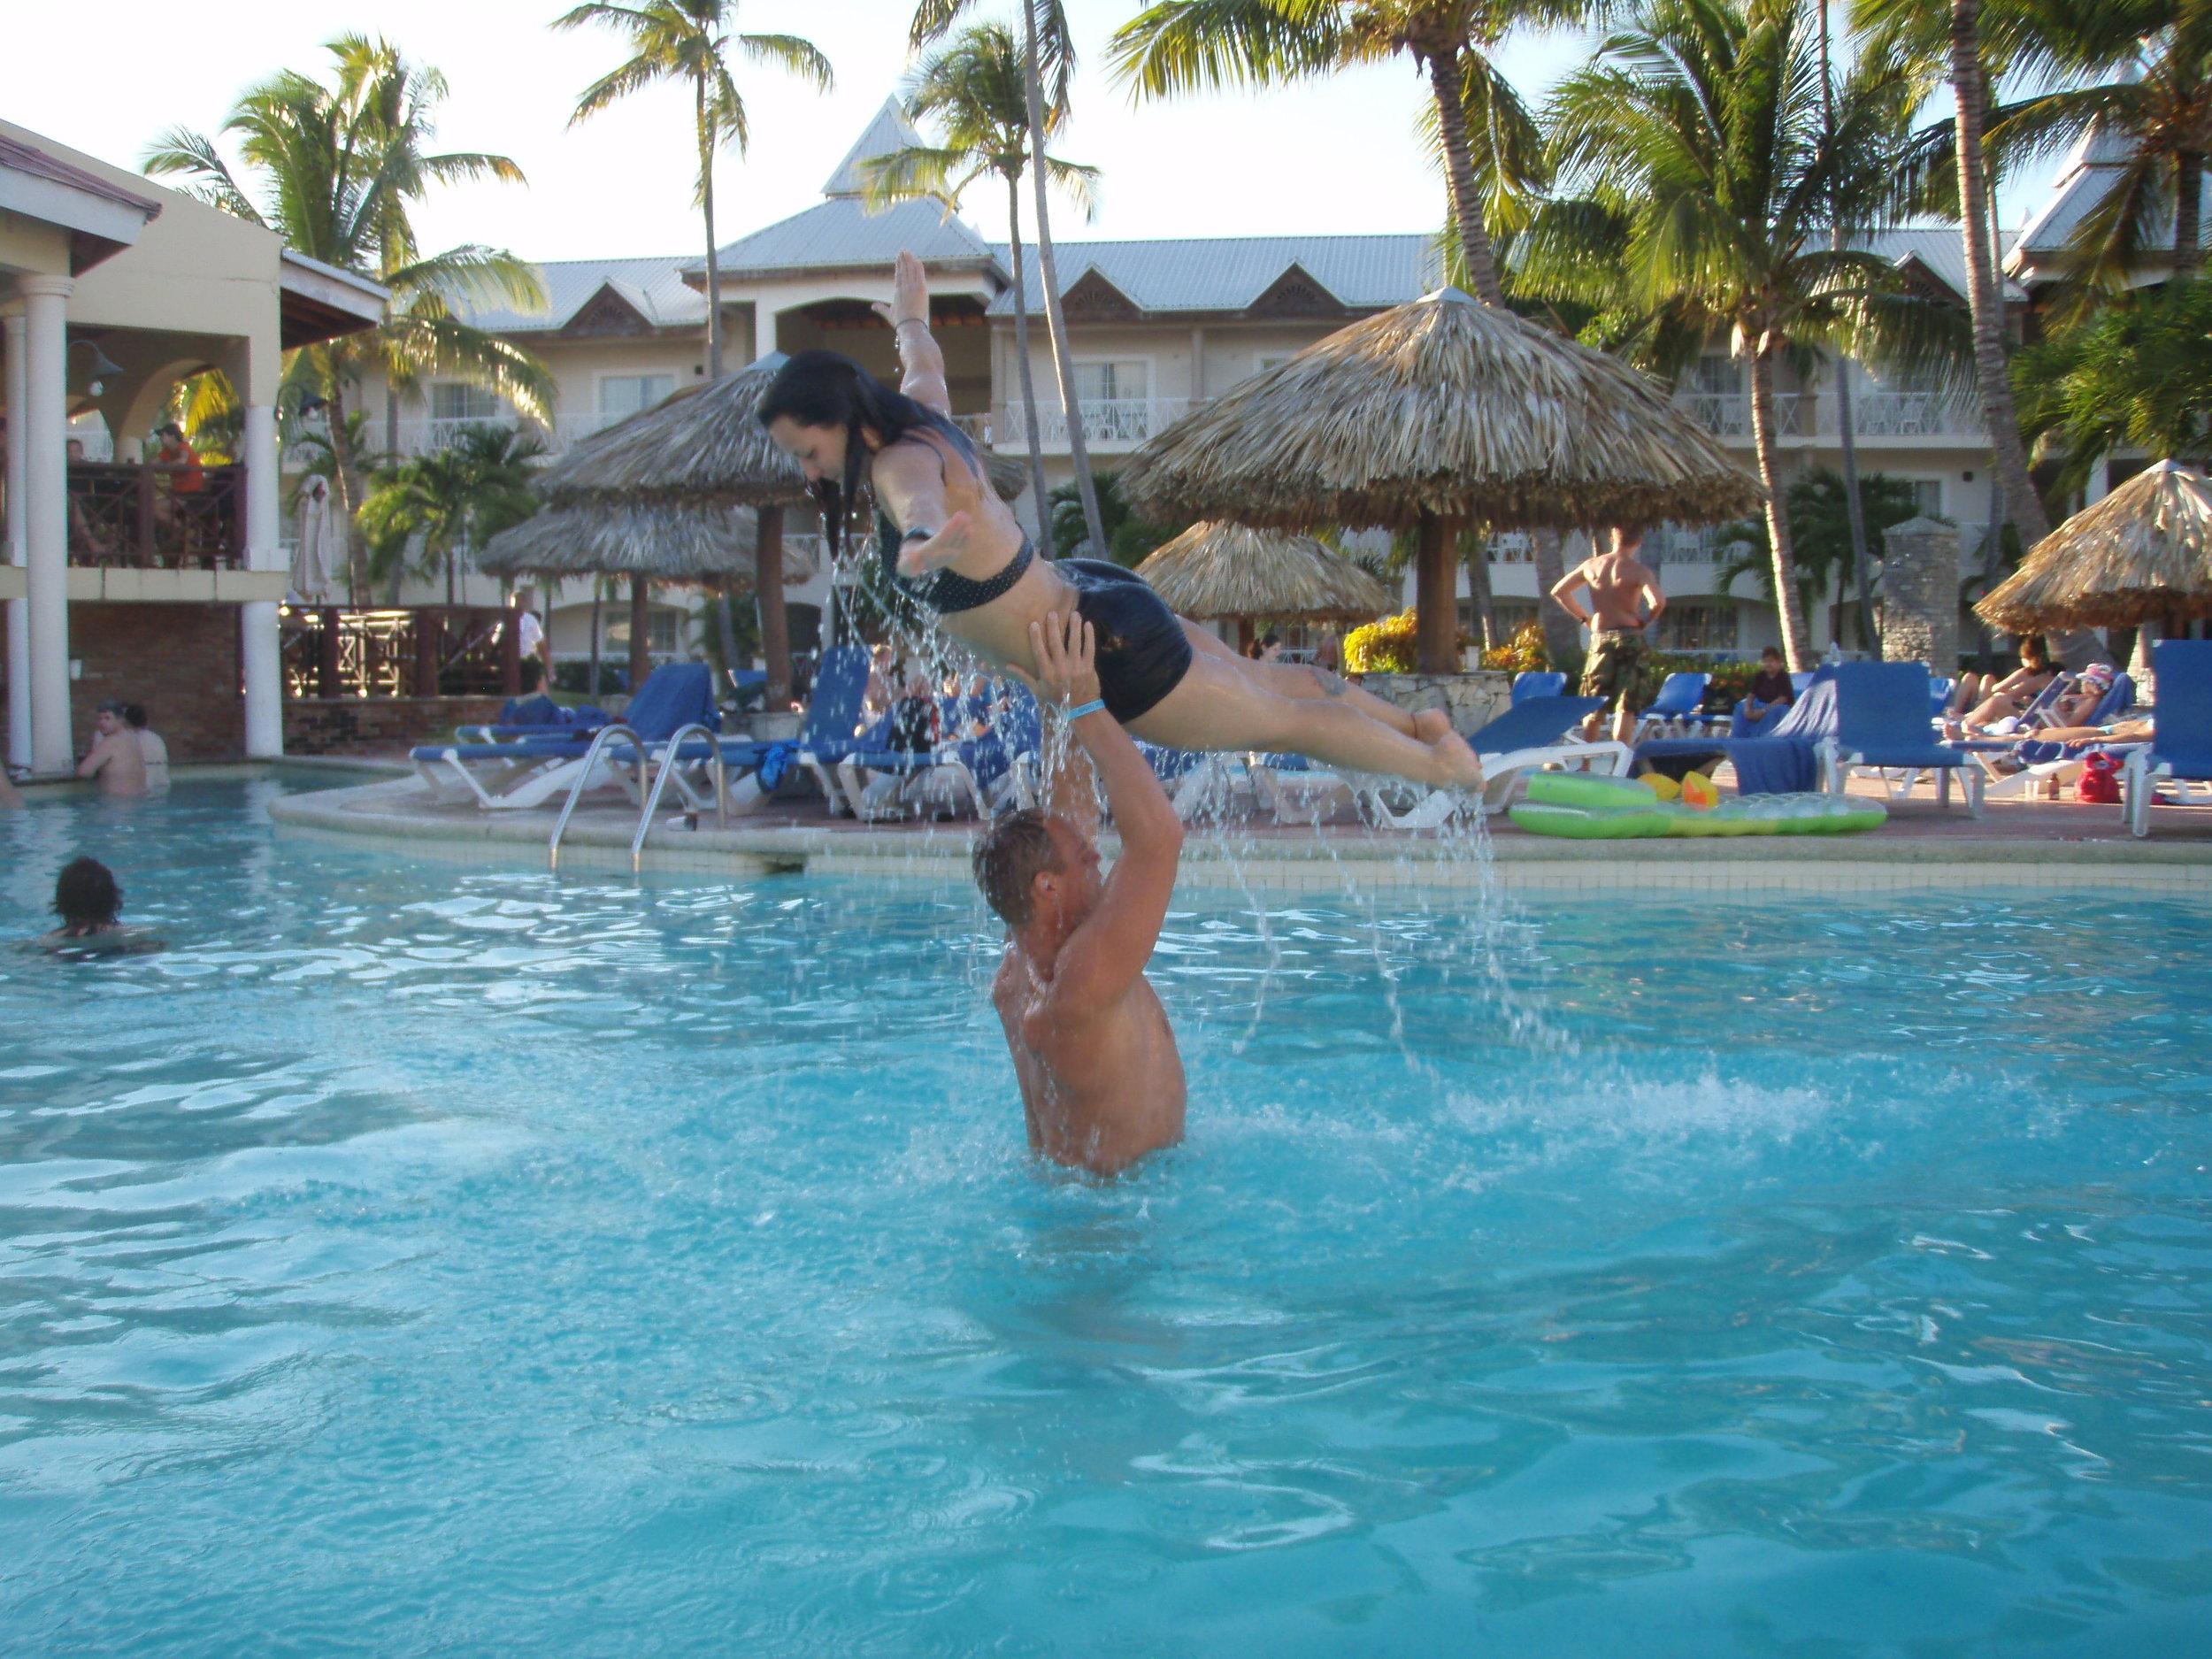 Dominican Republic December 2011